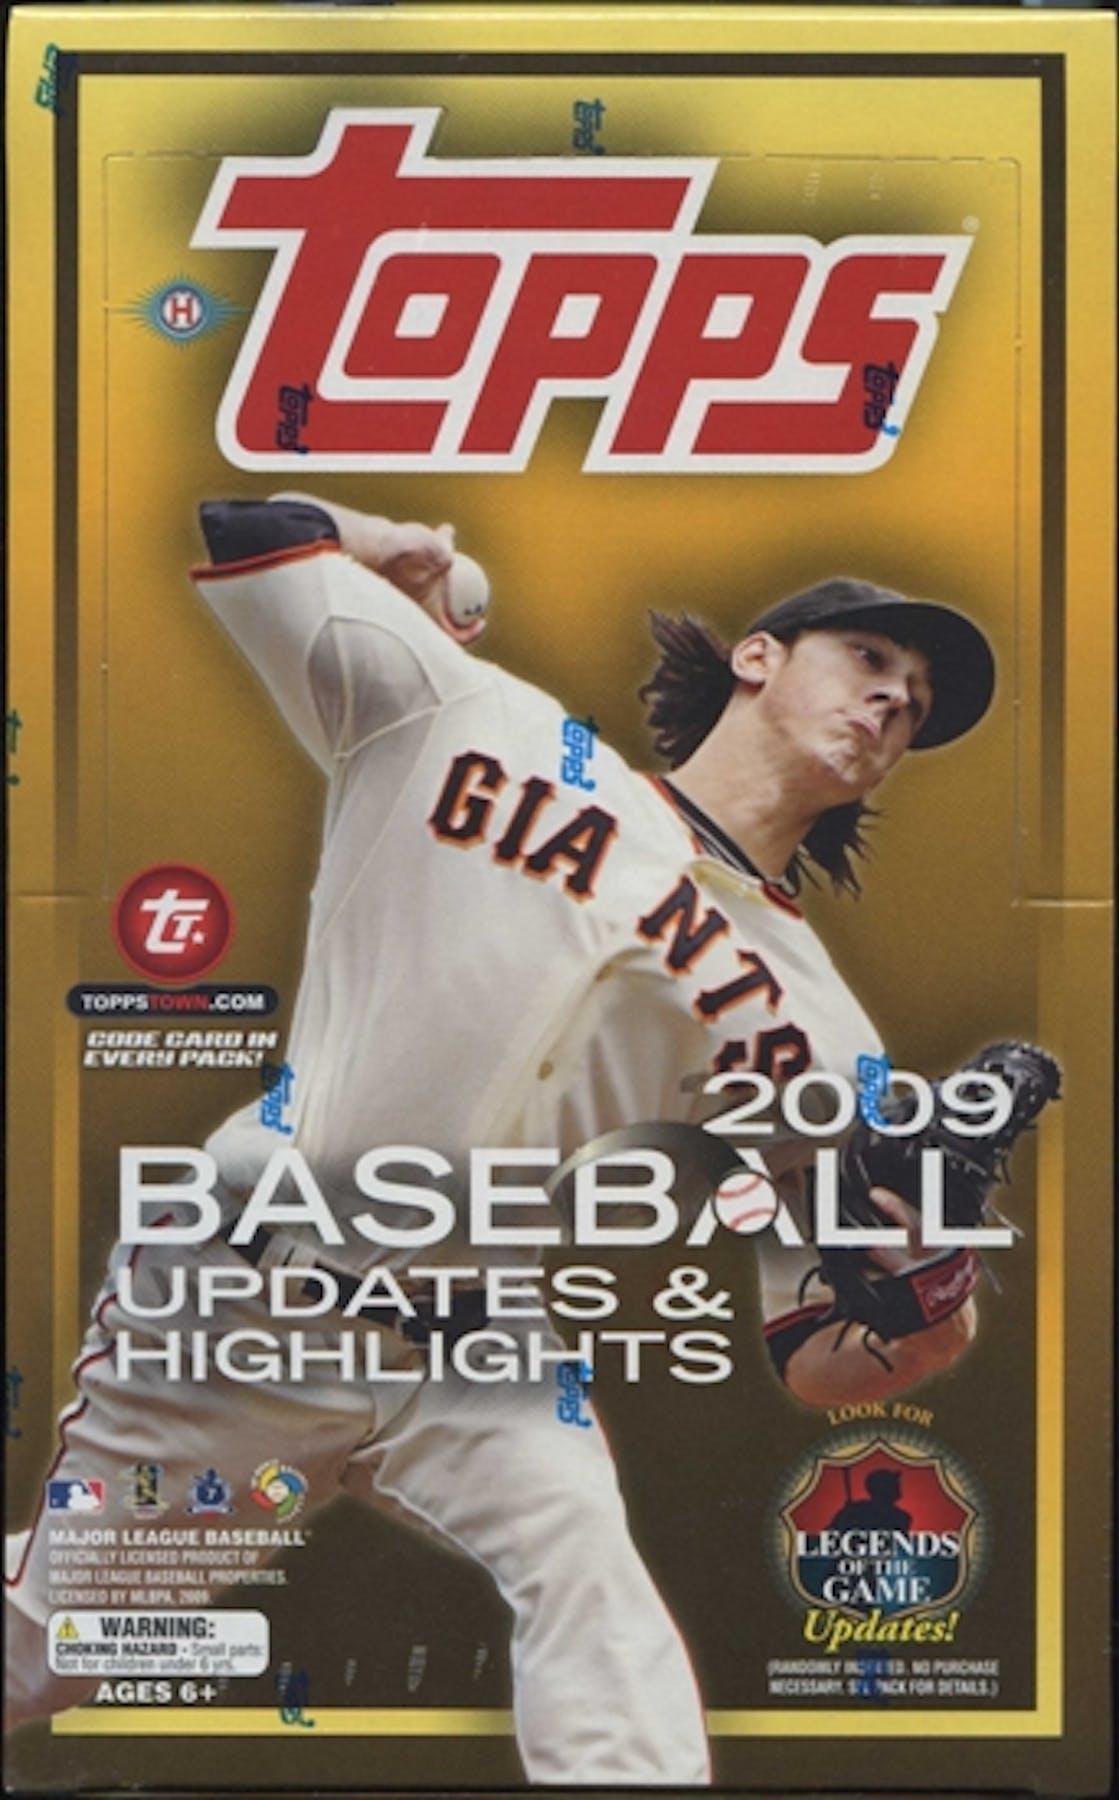 2009 Topps Updates Highlights Baseball Hobby Box Da Card World